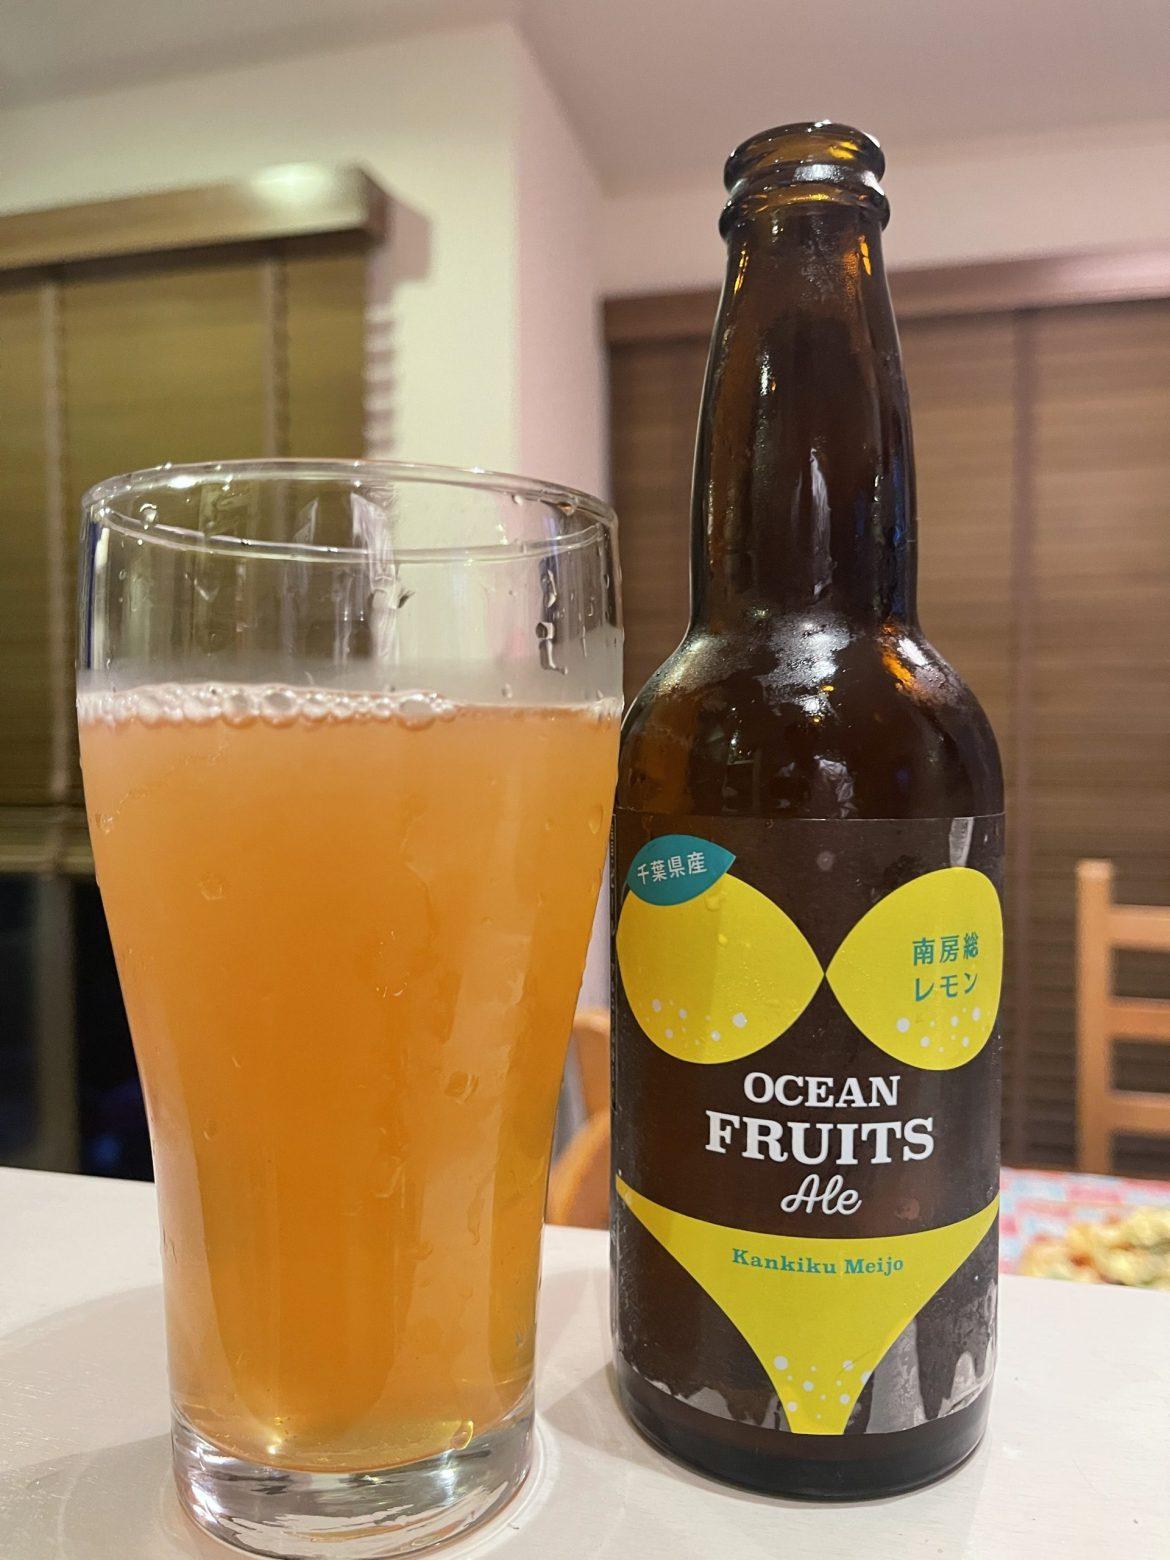 Kujukuri Ocean Fruits Ale